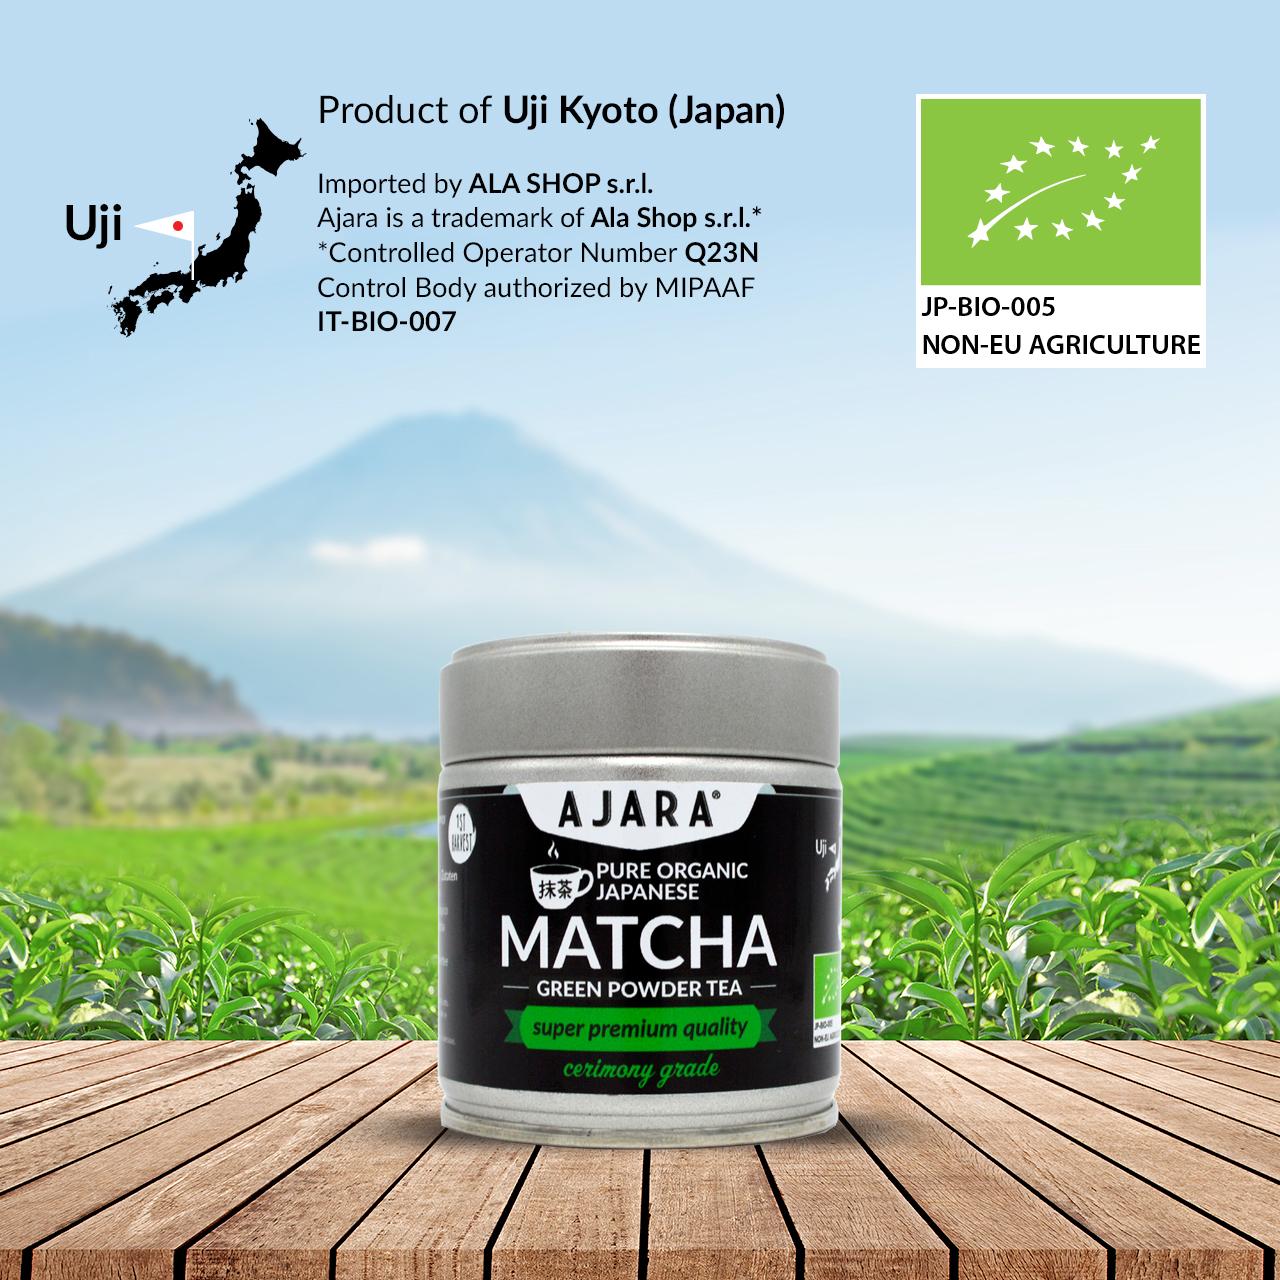 Zeremonieller grüner Tee aus Japan Uji Kyoto